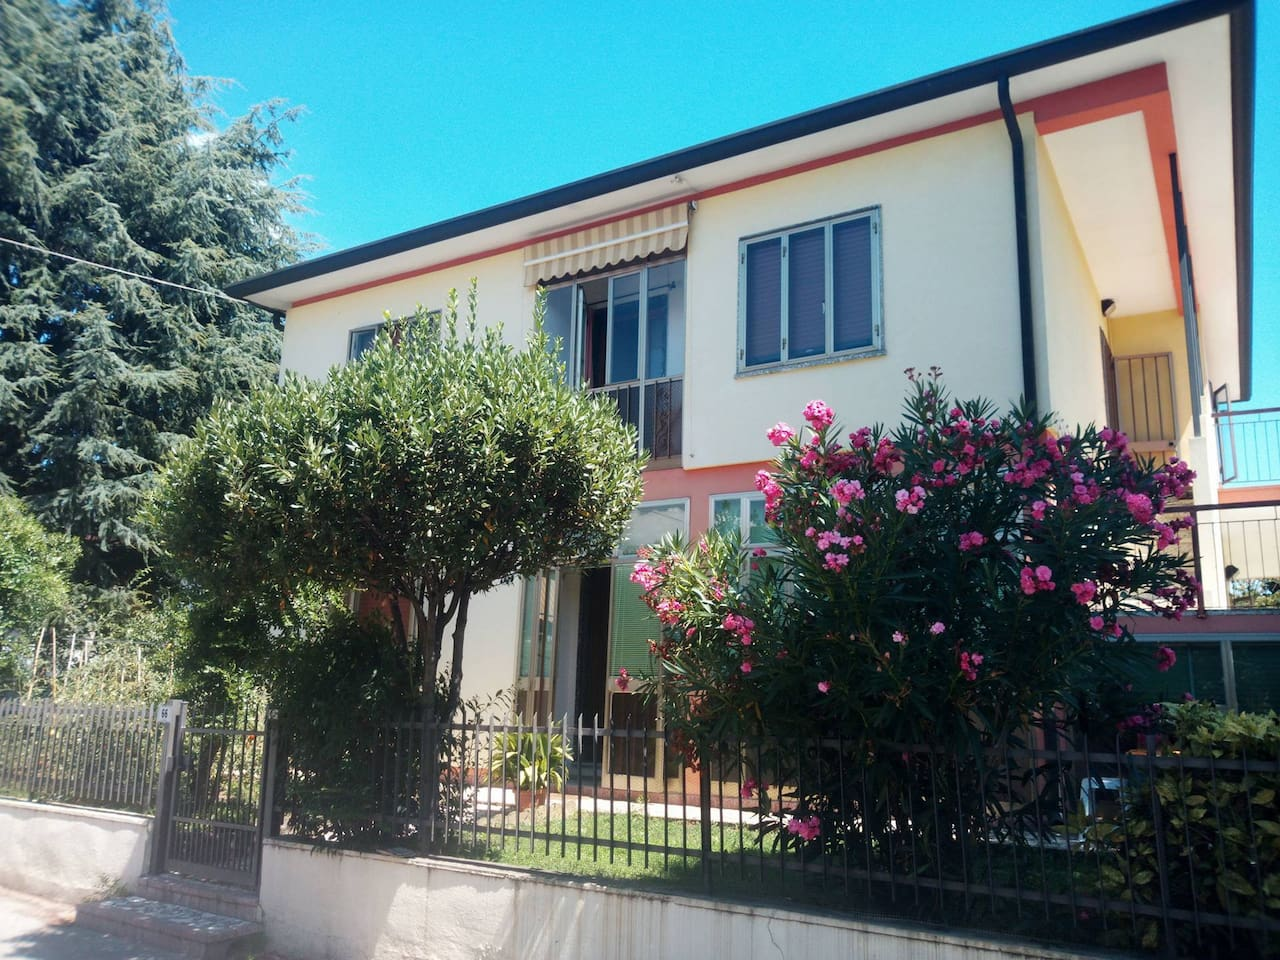 Cozy Casa in the central neighborhood